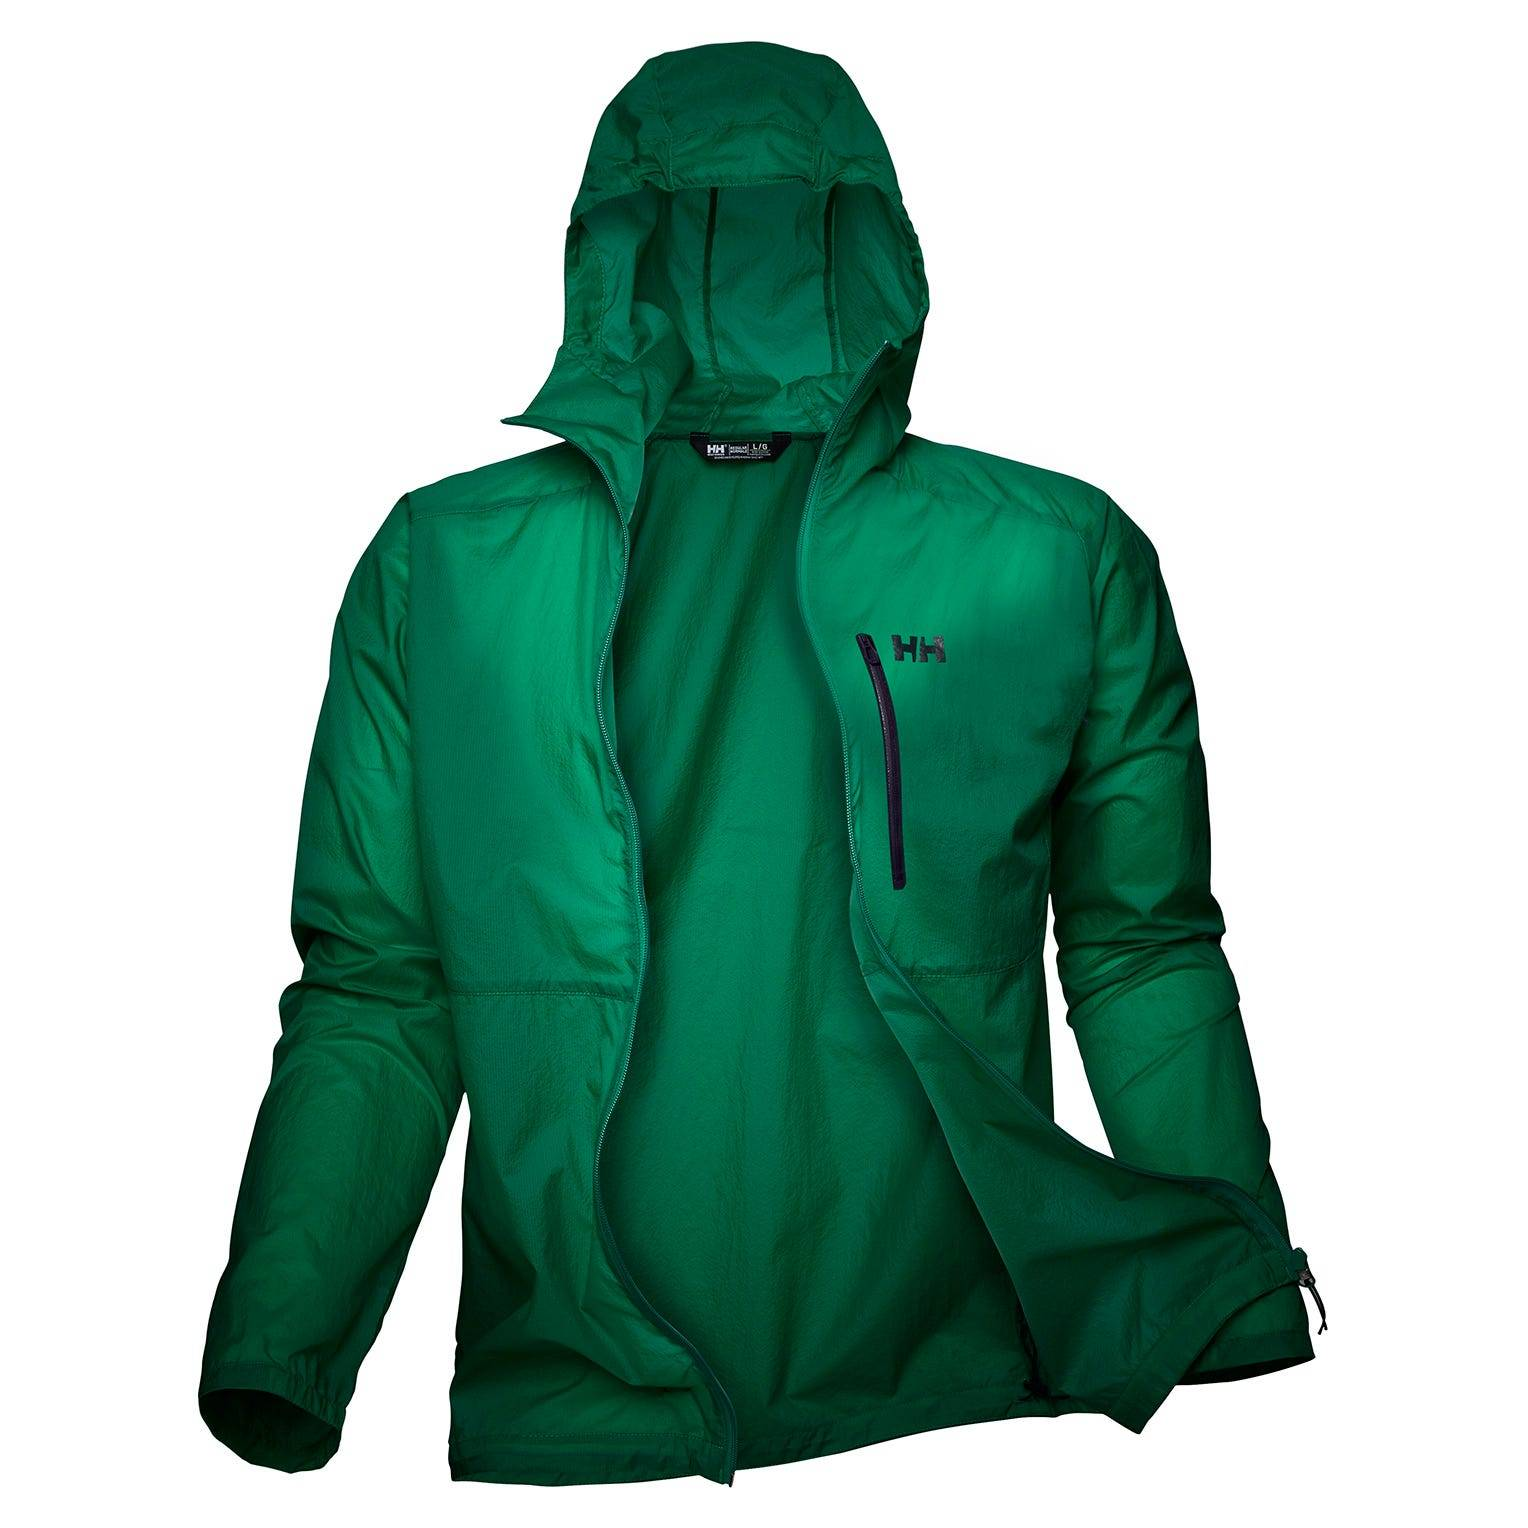 Helly Hansen Vana Windbreaker Jacket Mens Hiking Green M